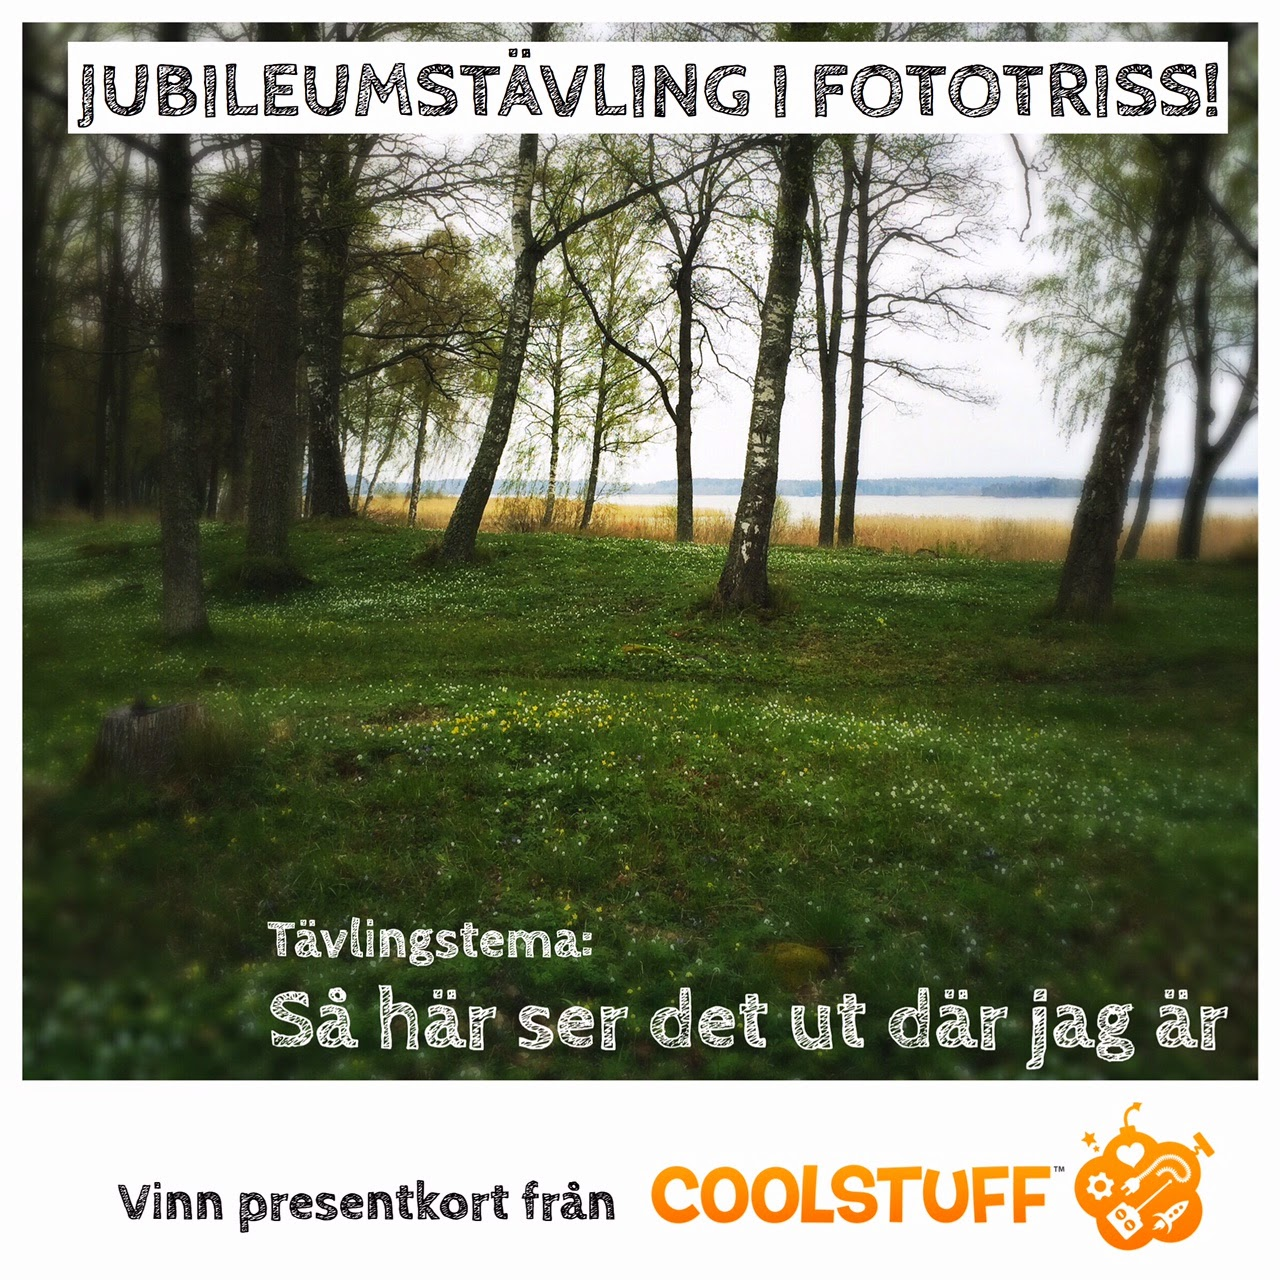 www.coolstuff.se/nyheter